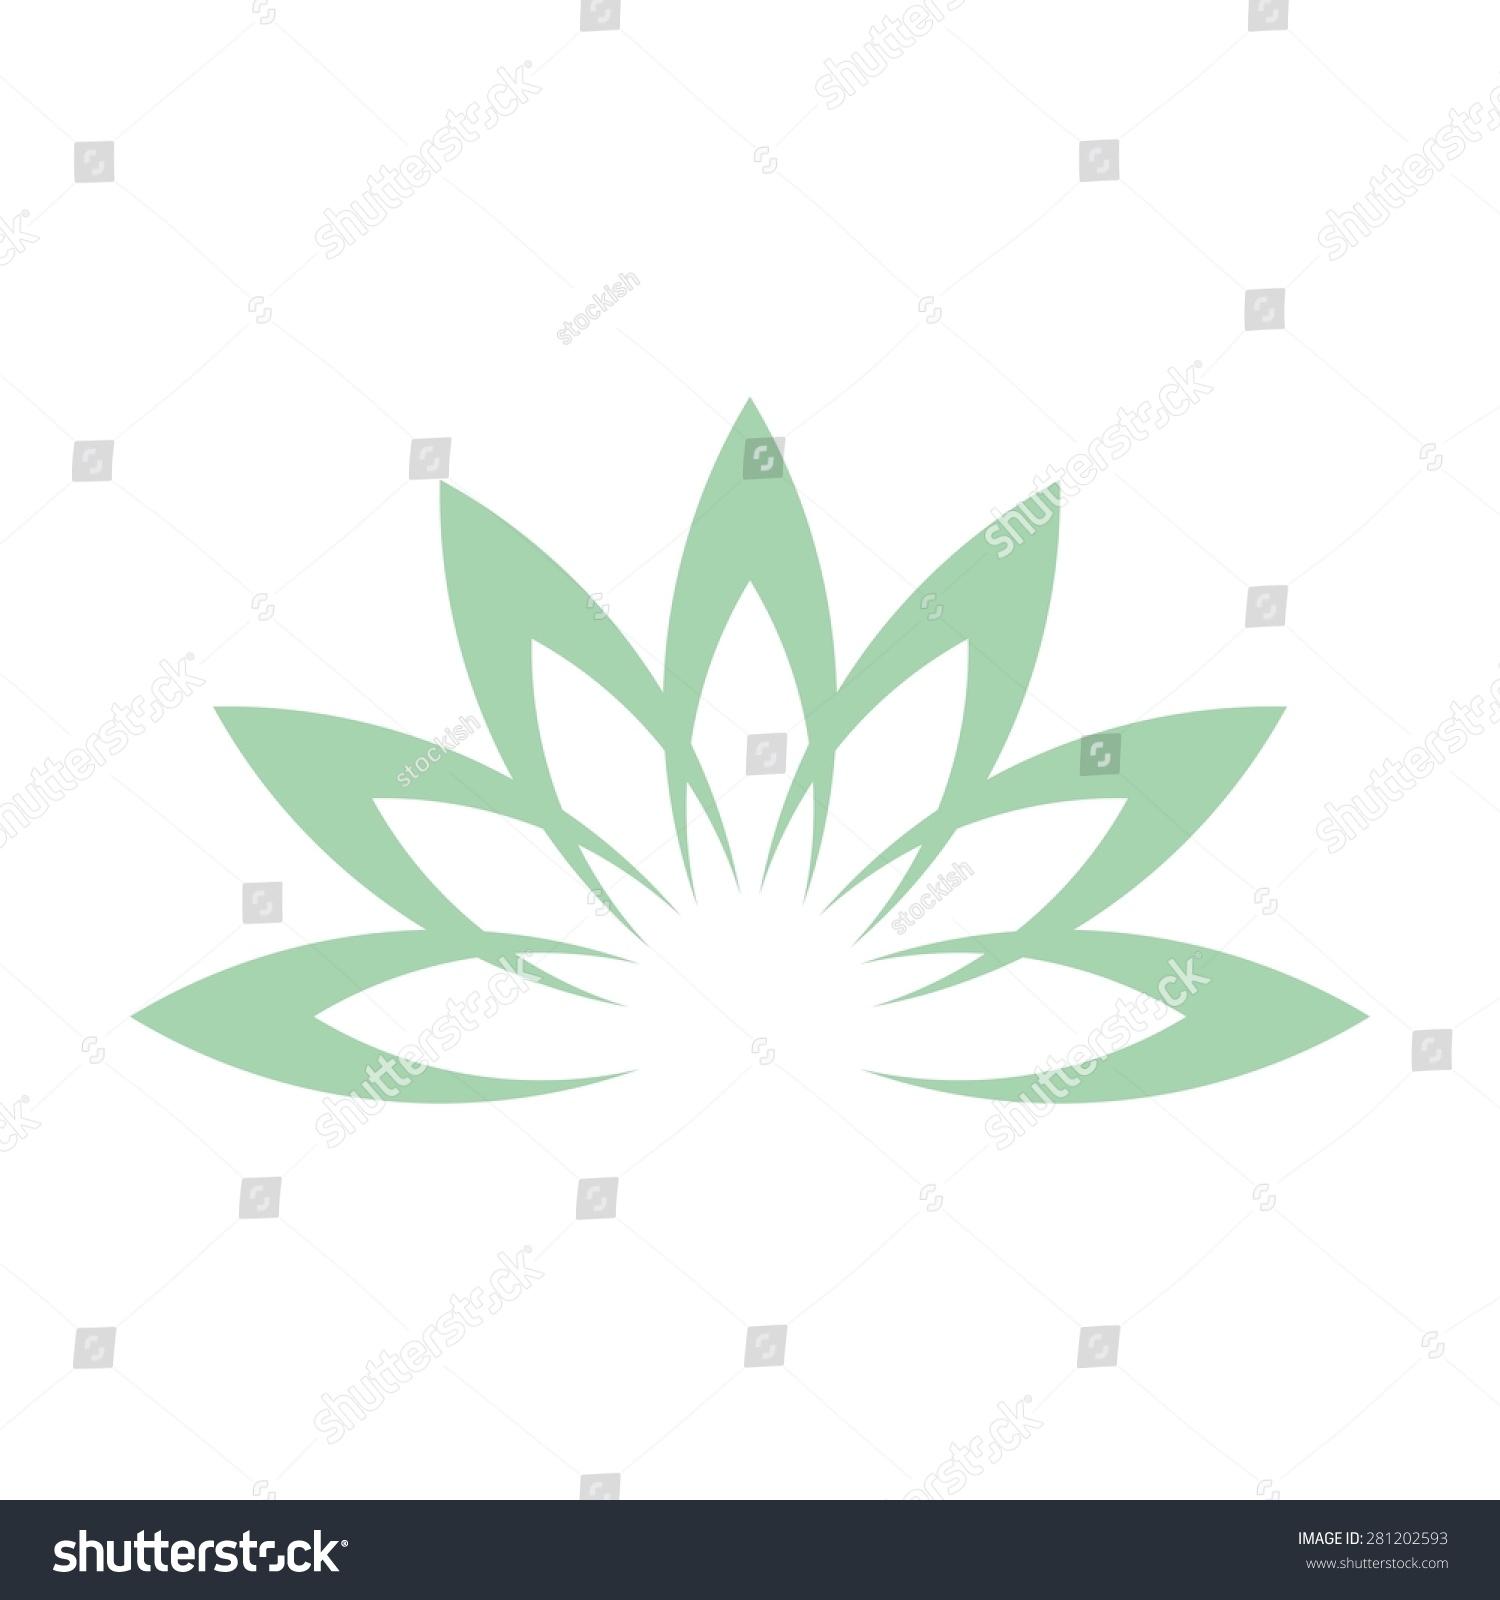 Lotus flower abstract vector logo design stock vector 2018 lotus flower abstract vector logo design template health spa creative idea asian culture mightylinksfo